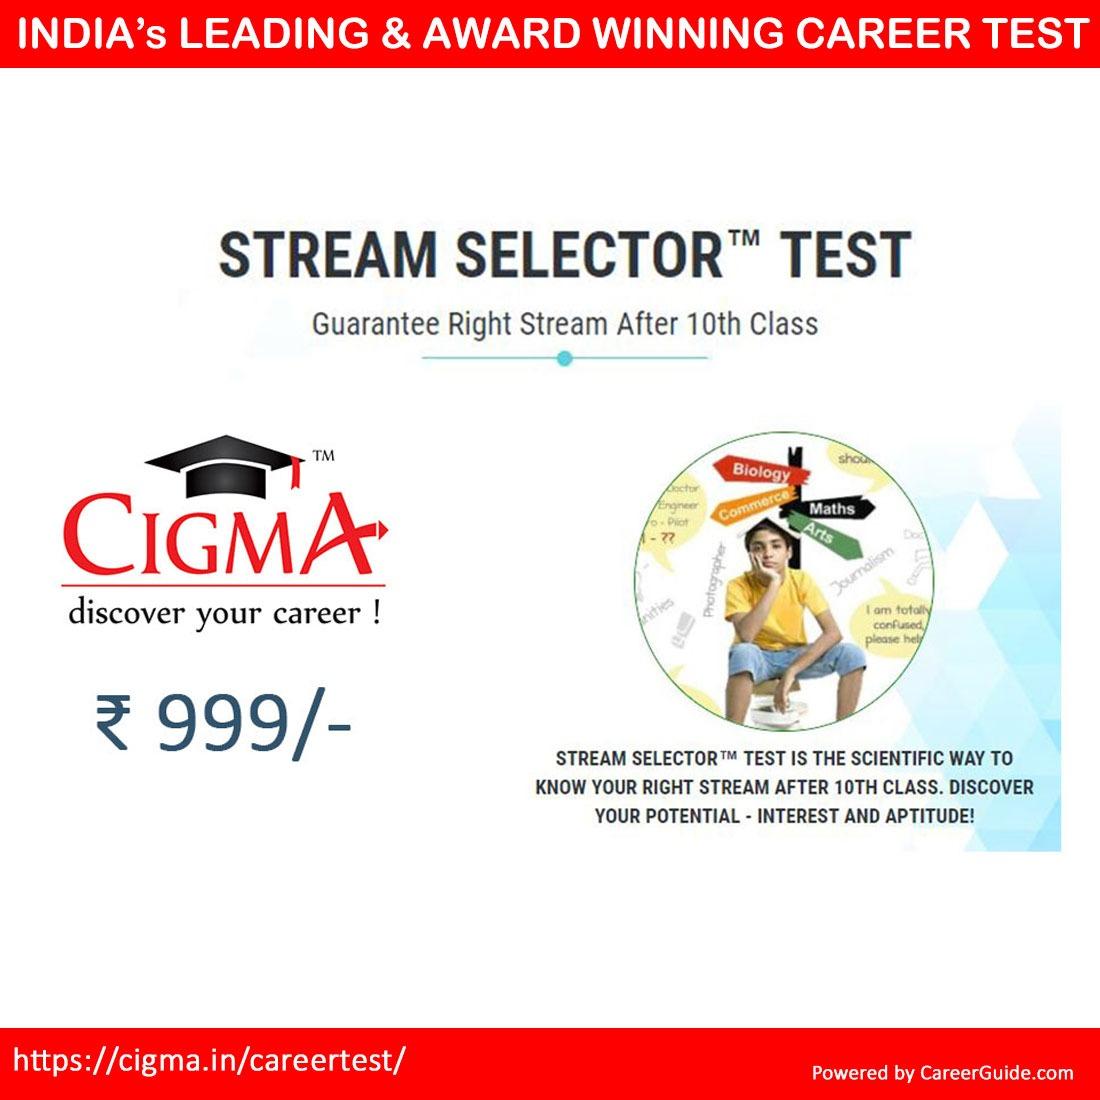 CIGMA STREAM SELECTOR TEST